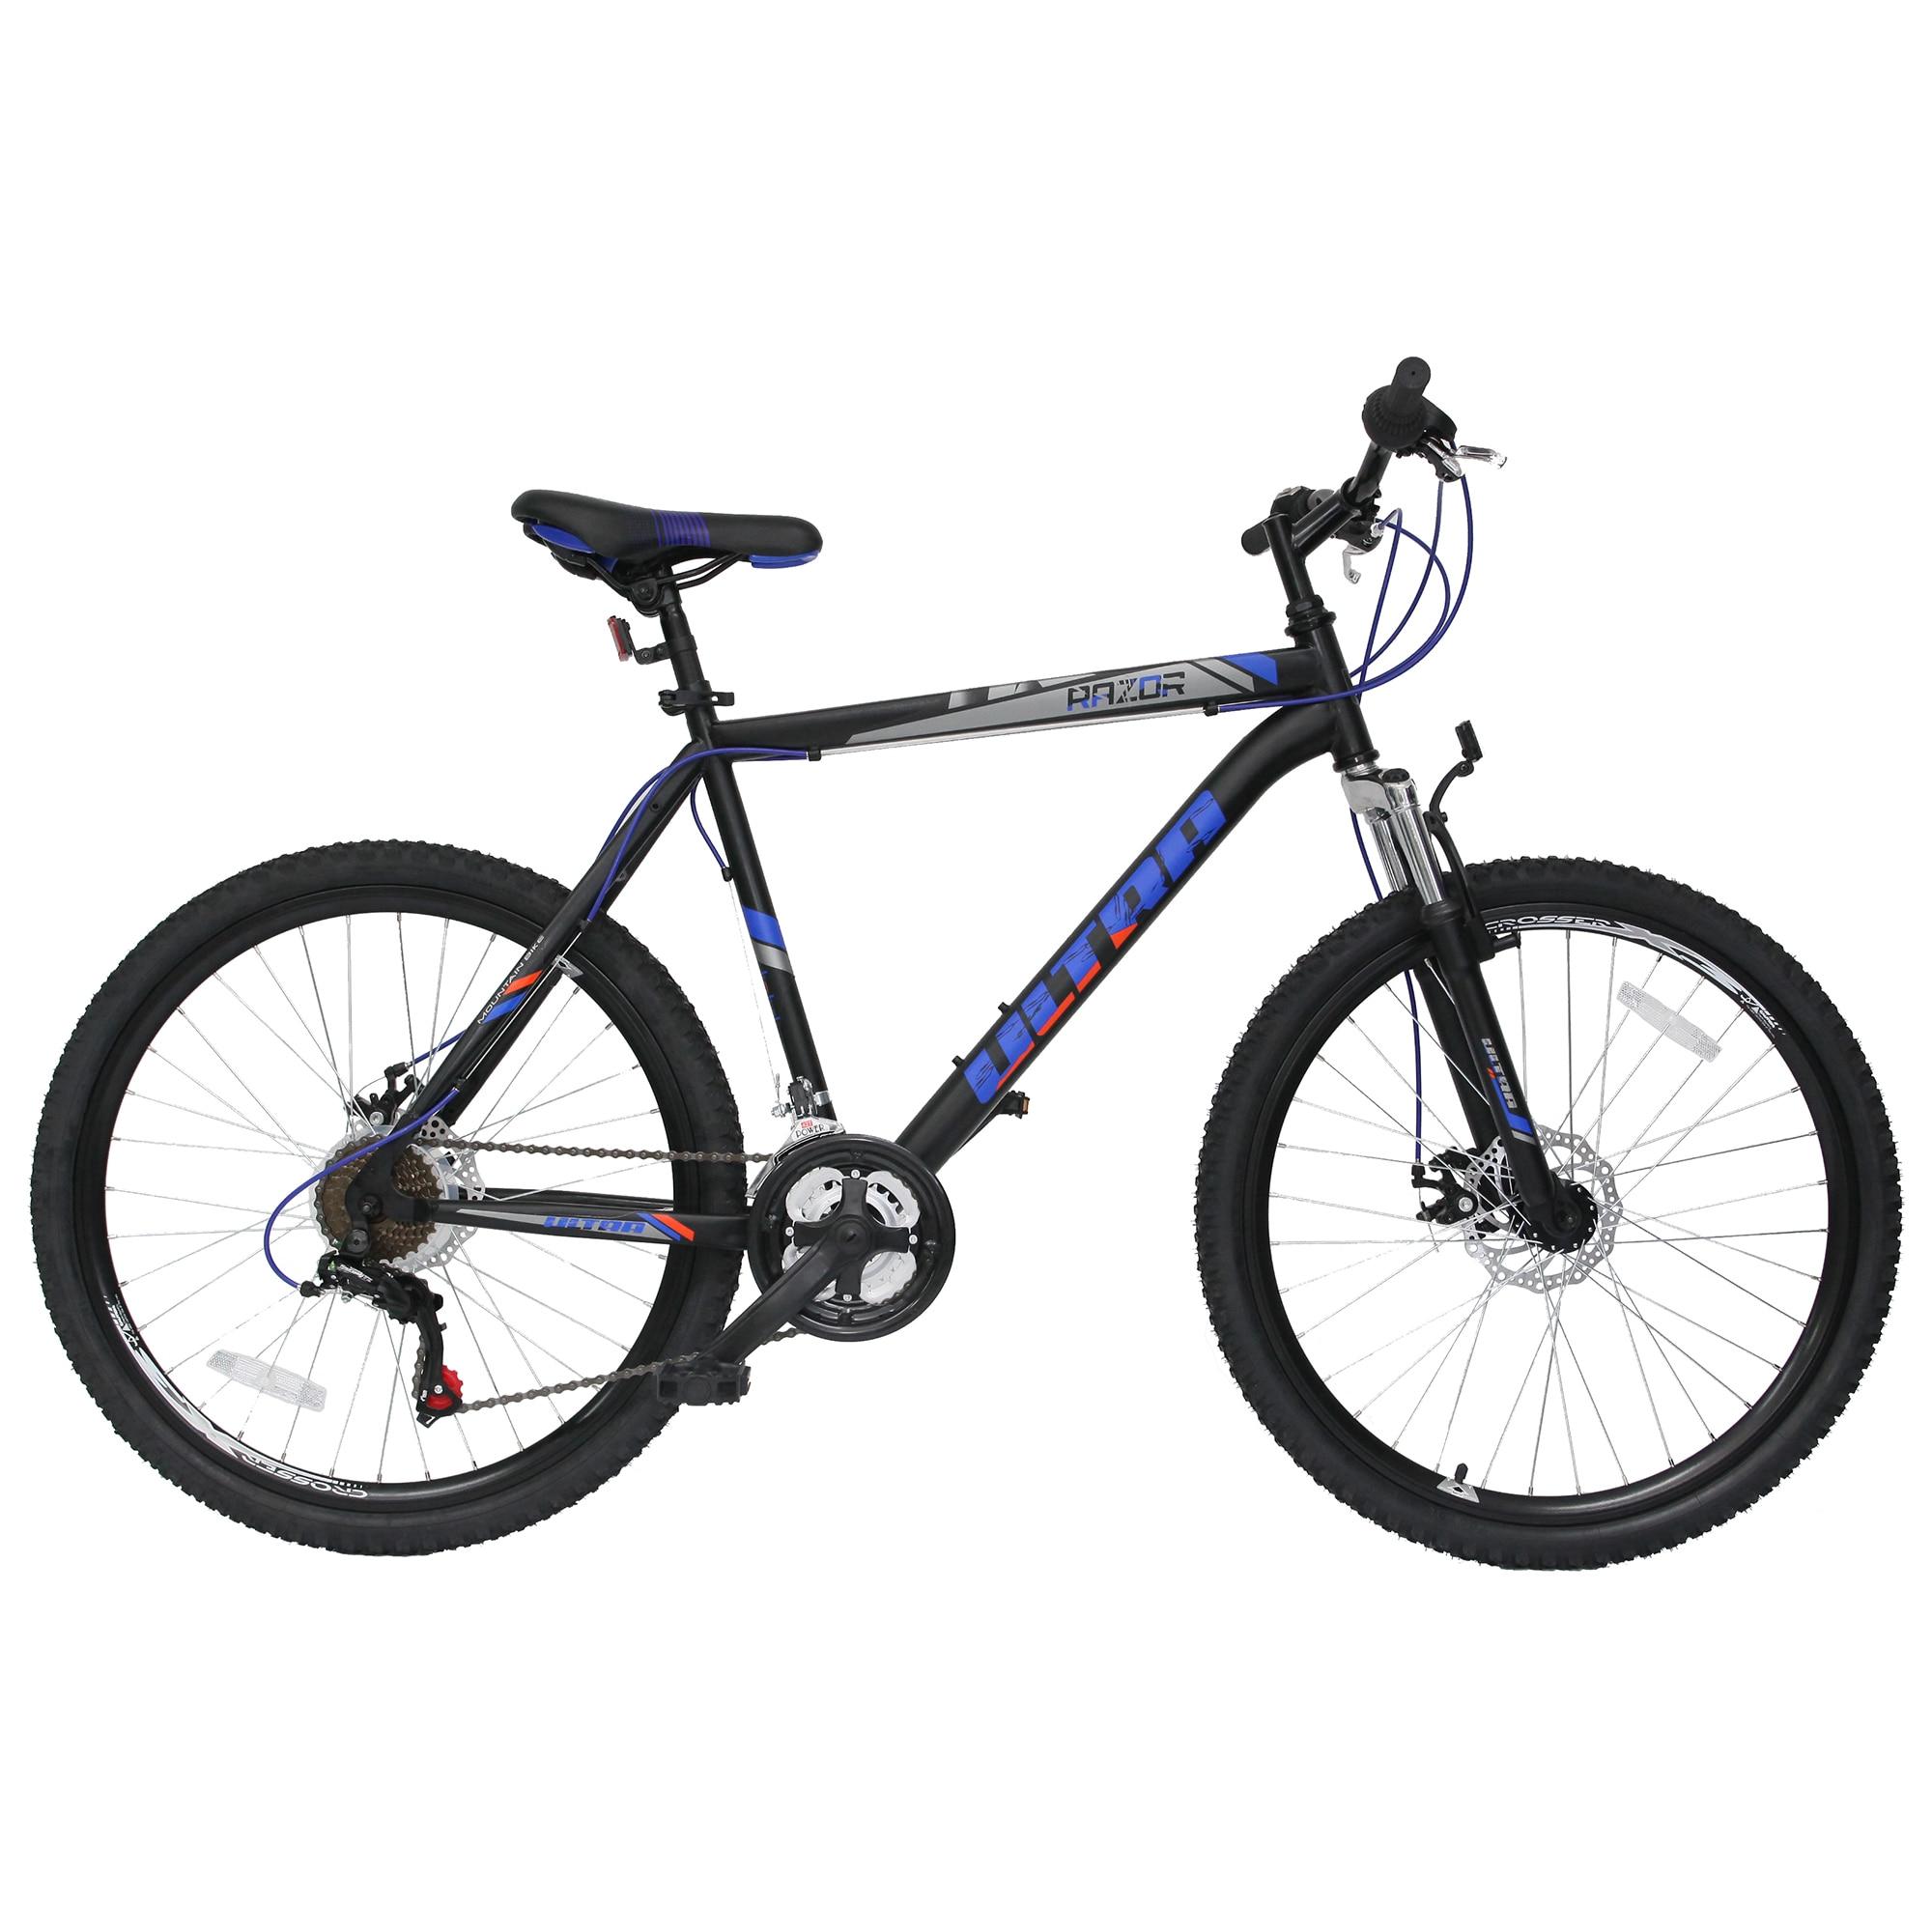 "Fotografie Bicicleta MTB 26"" Ultra Razor, Blak/Blue, 52cm, L"